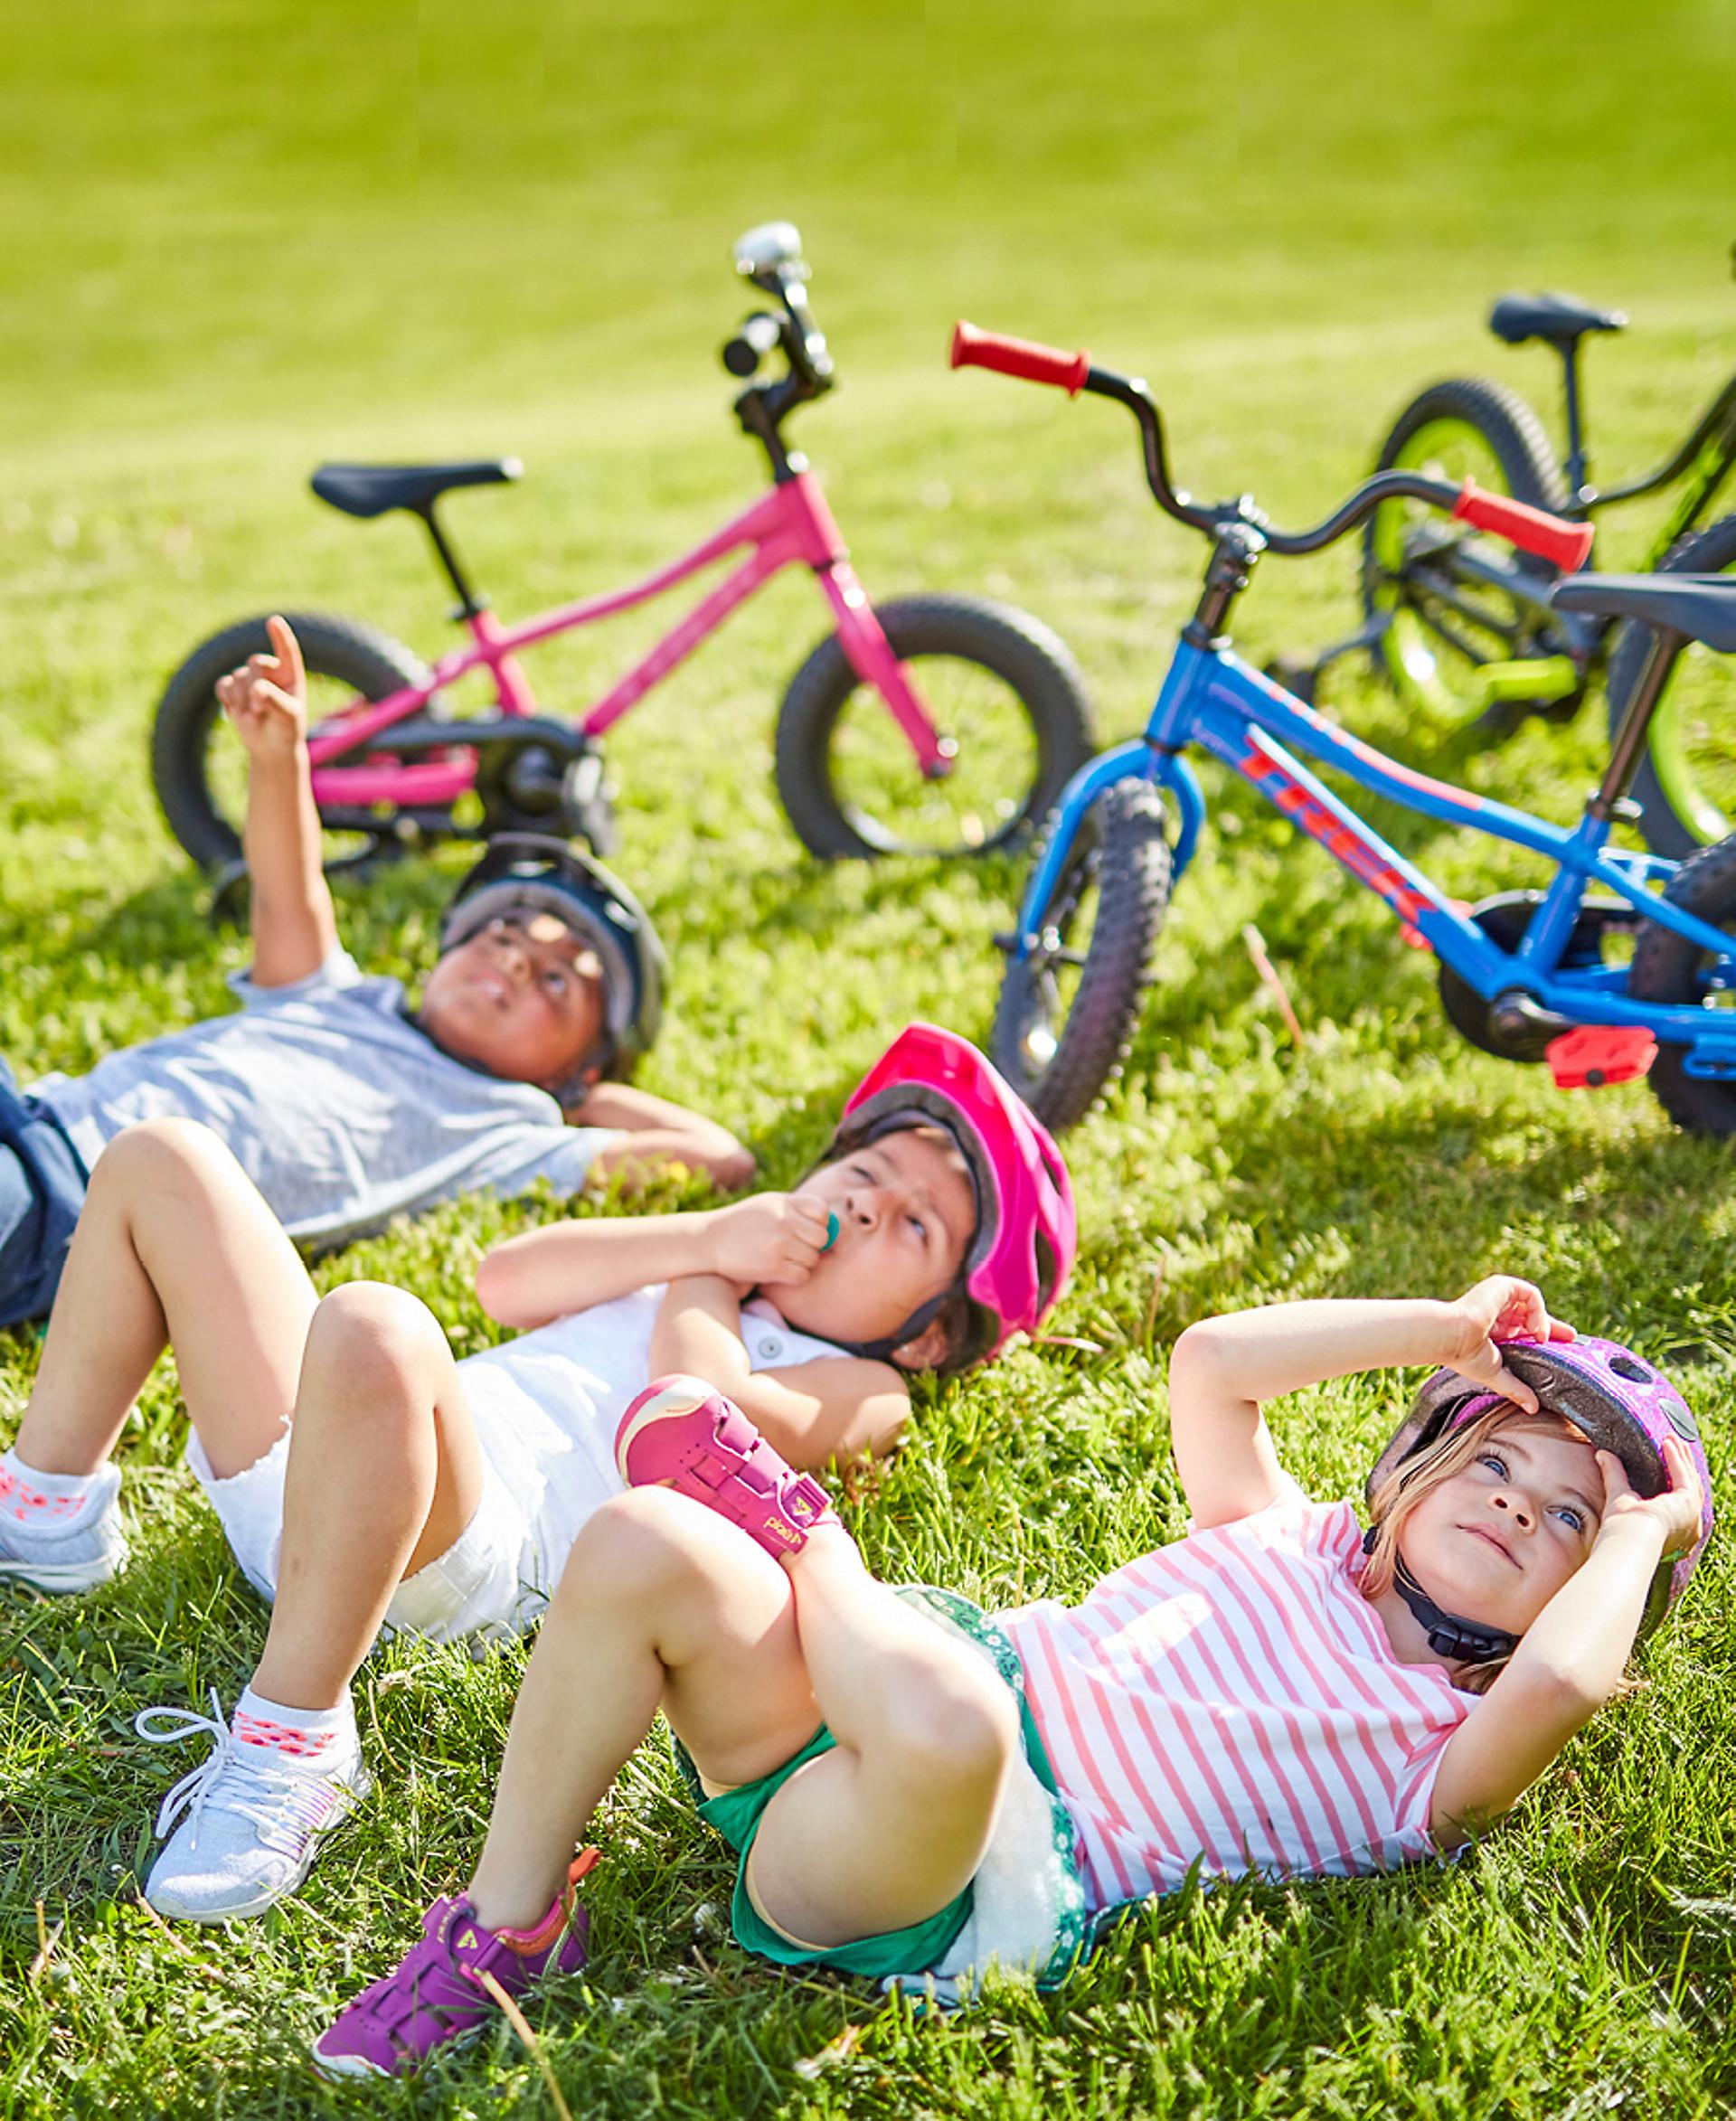 Childrens Jersey Youth Biking Shirt Kids Bike Jerseys Childs Gear 5 colors